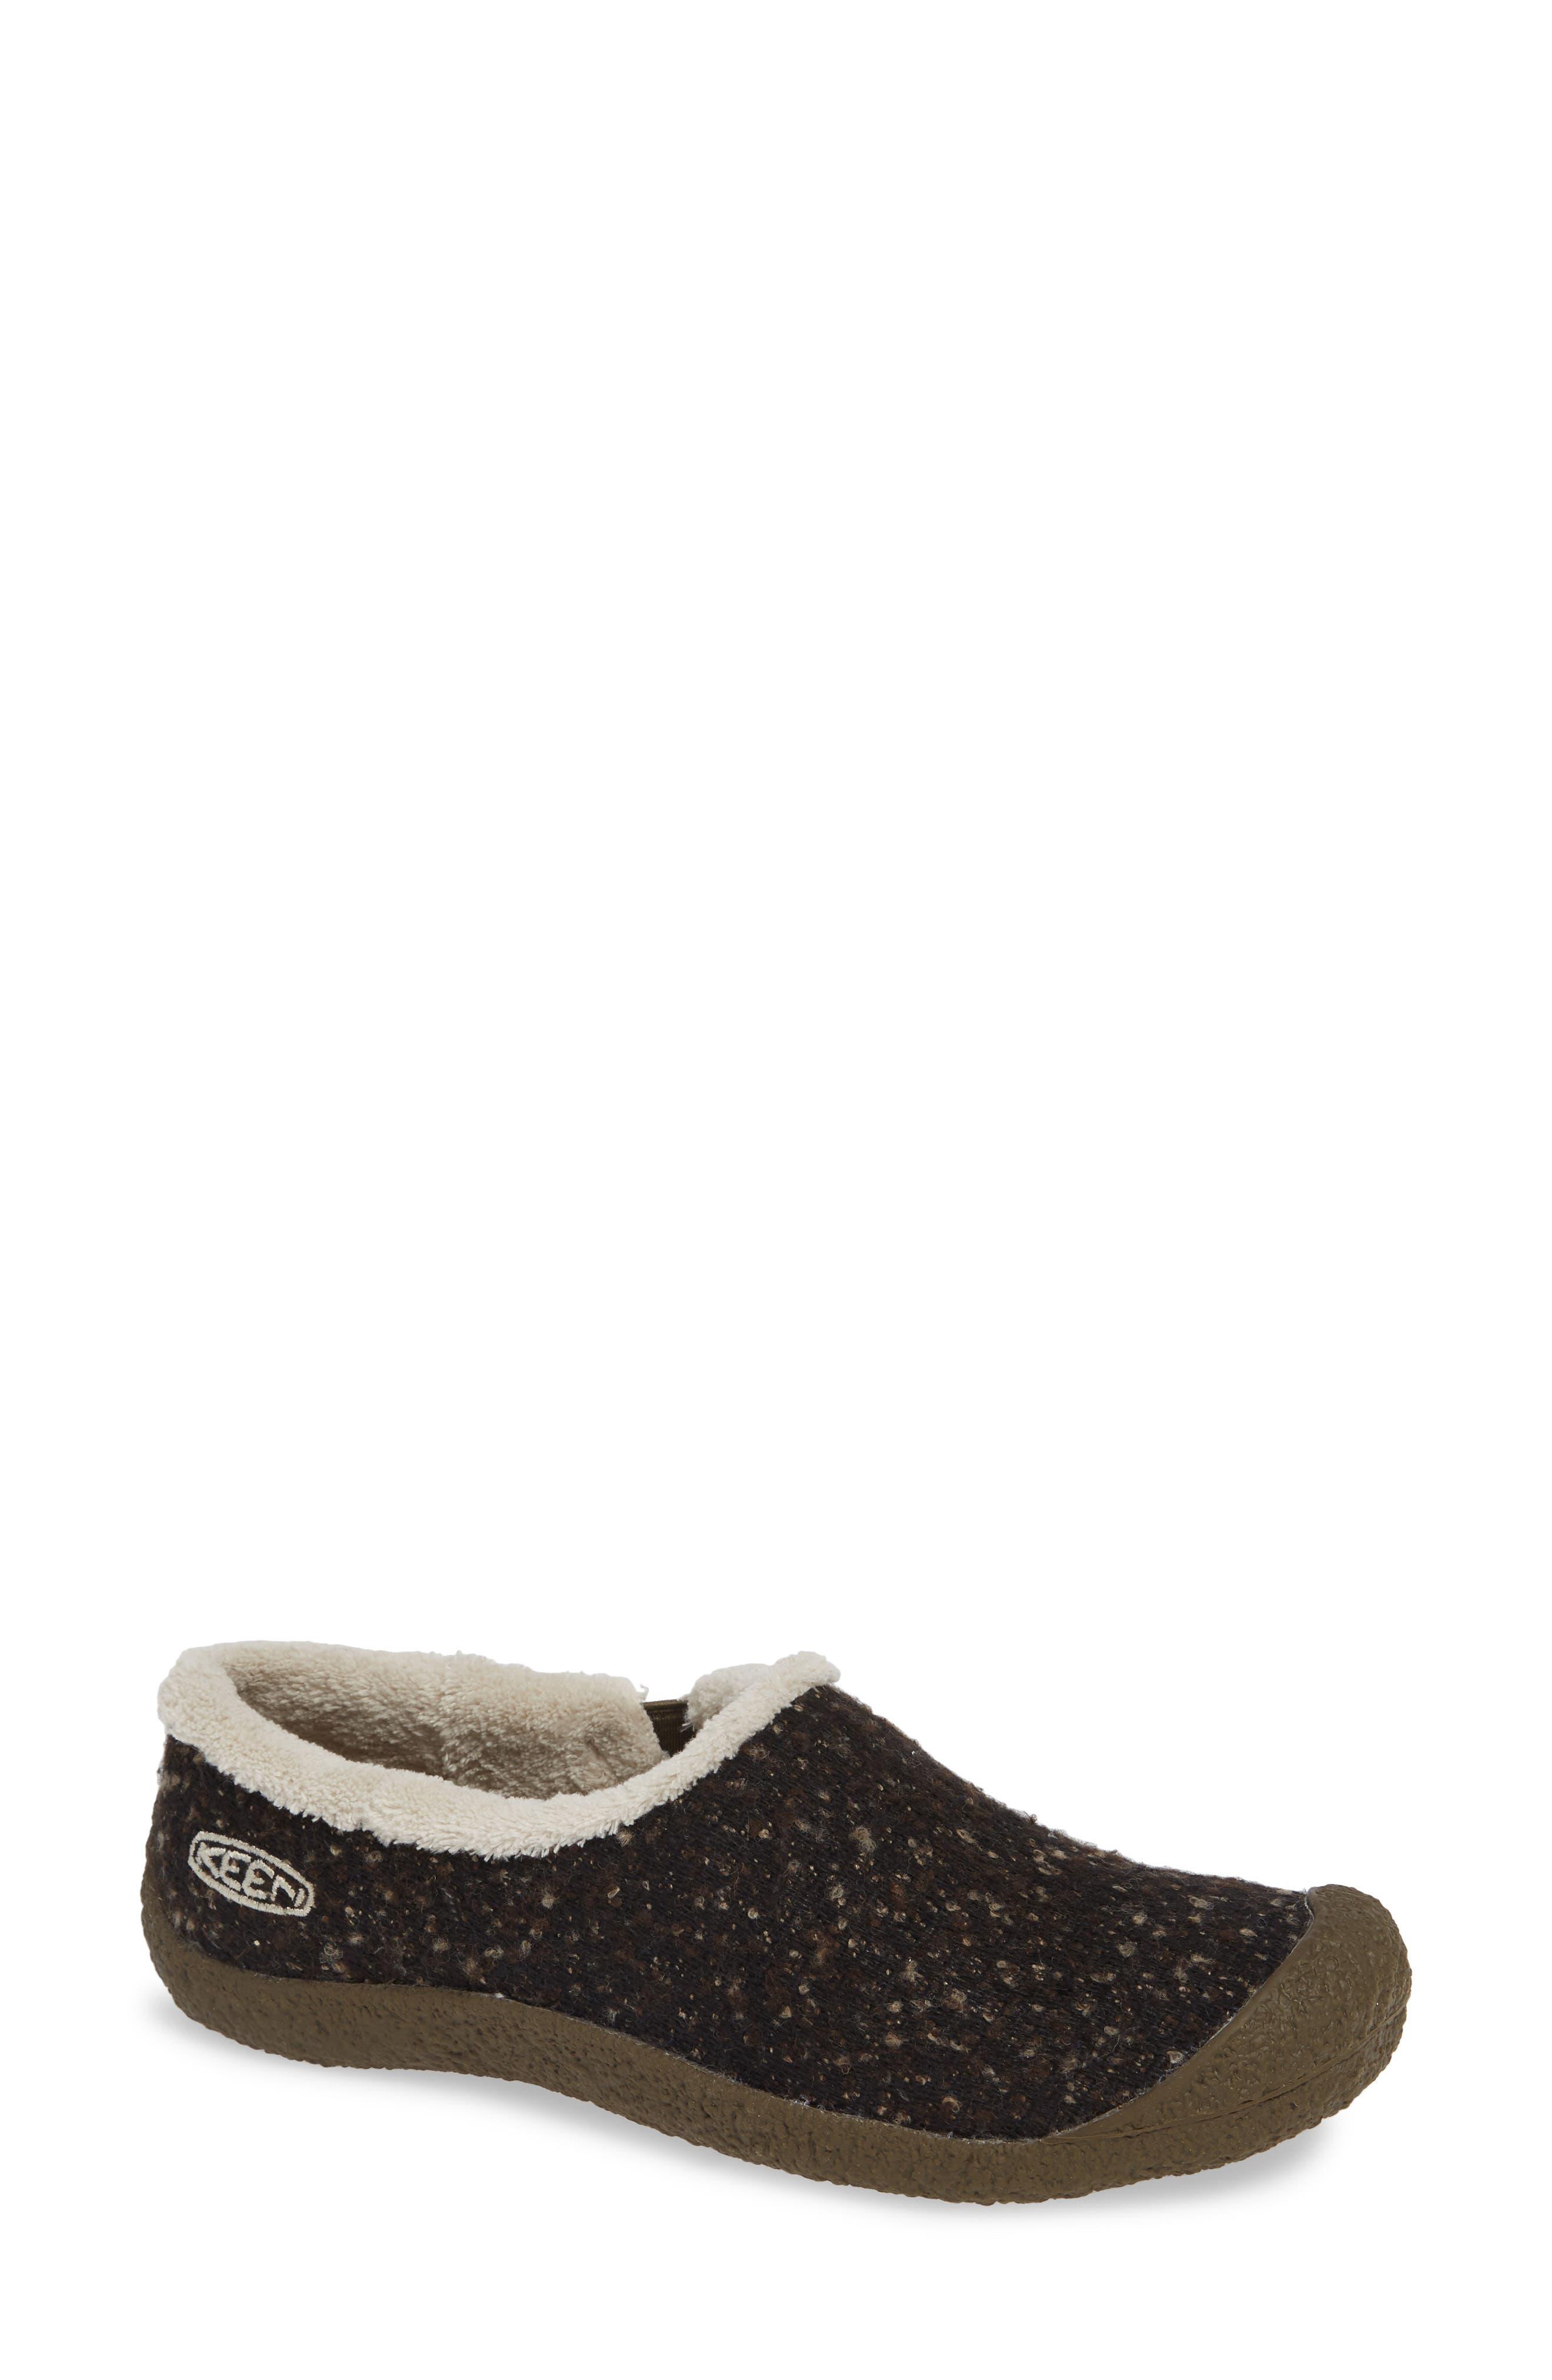 Keen Howser Round Toe Wool Slip-On, Brown